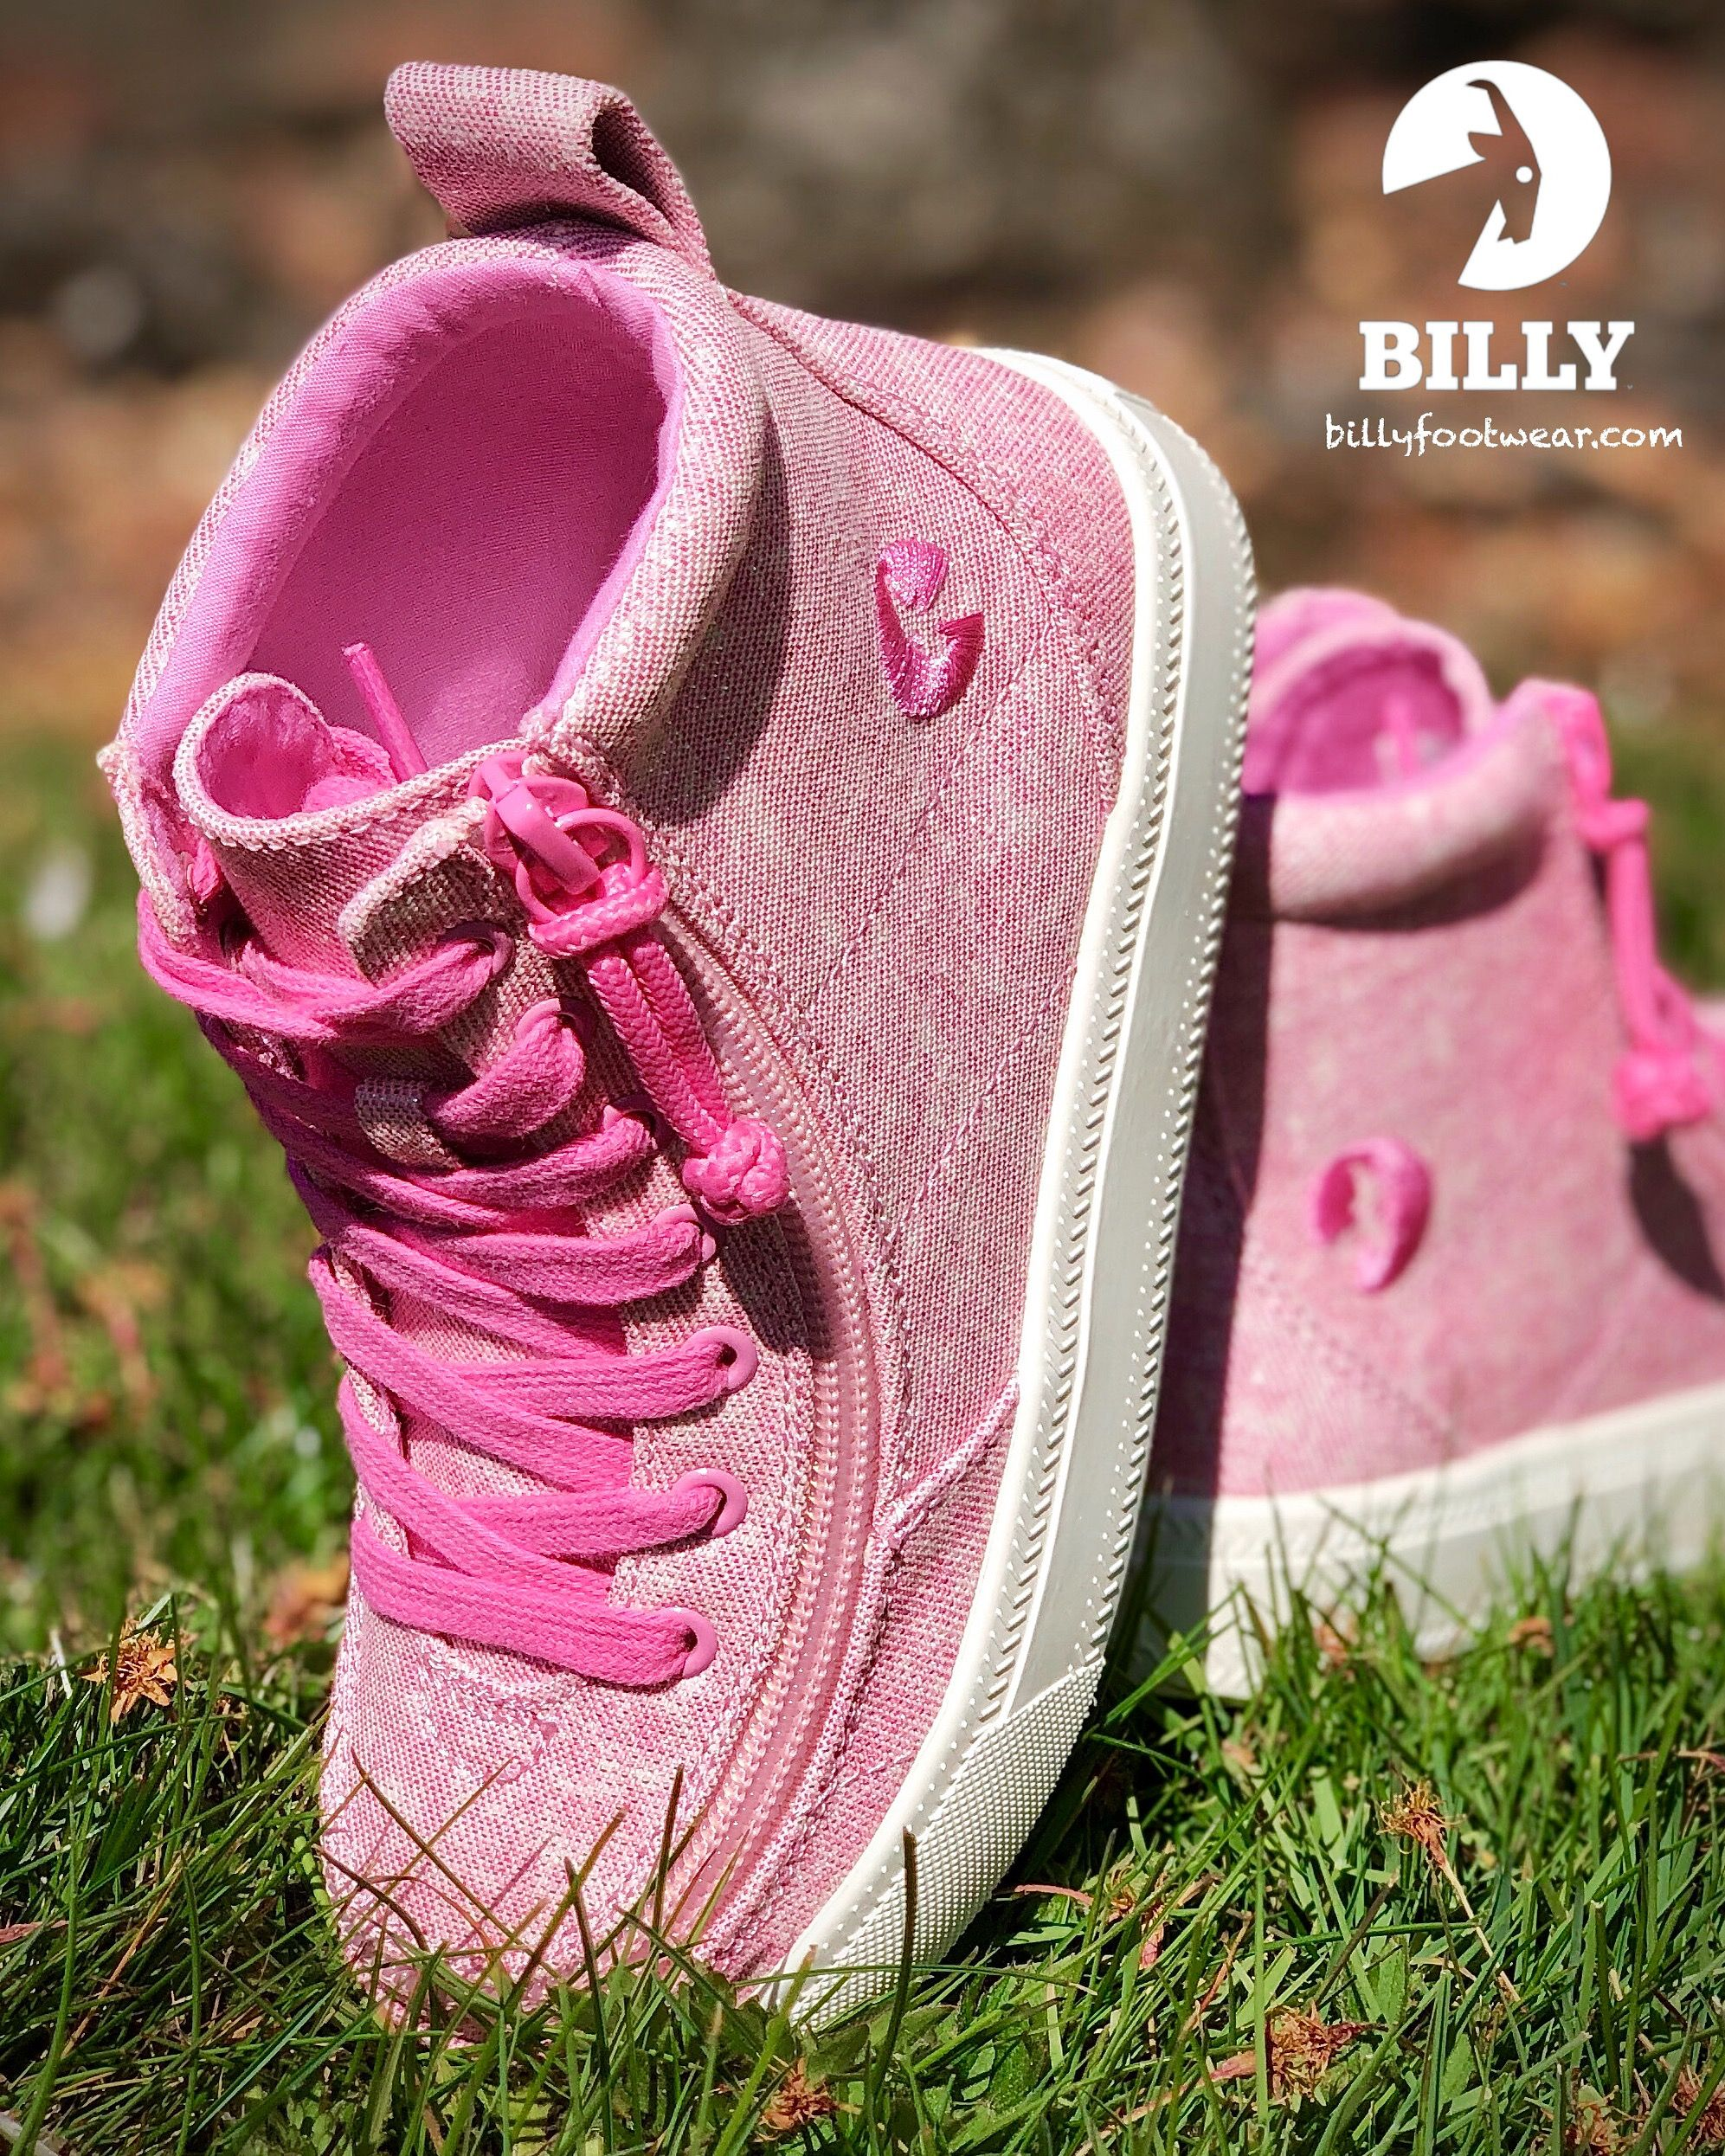 Billy Footwear High Top Pink Glitter